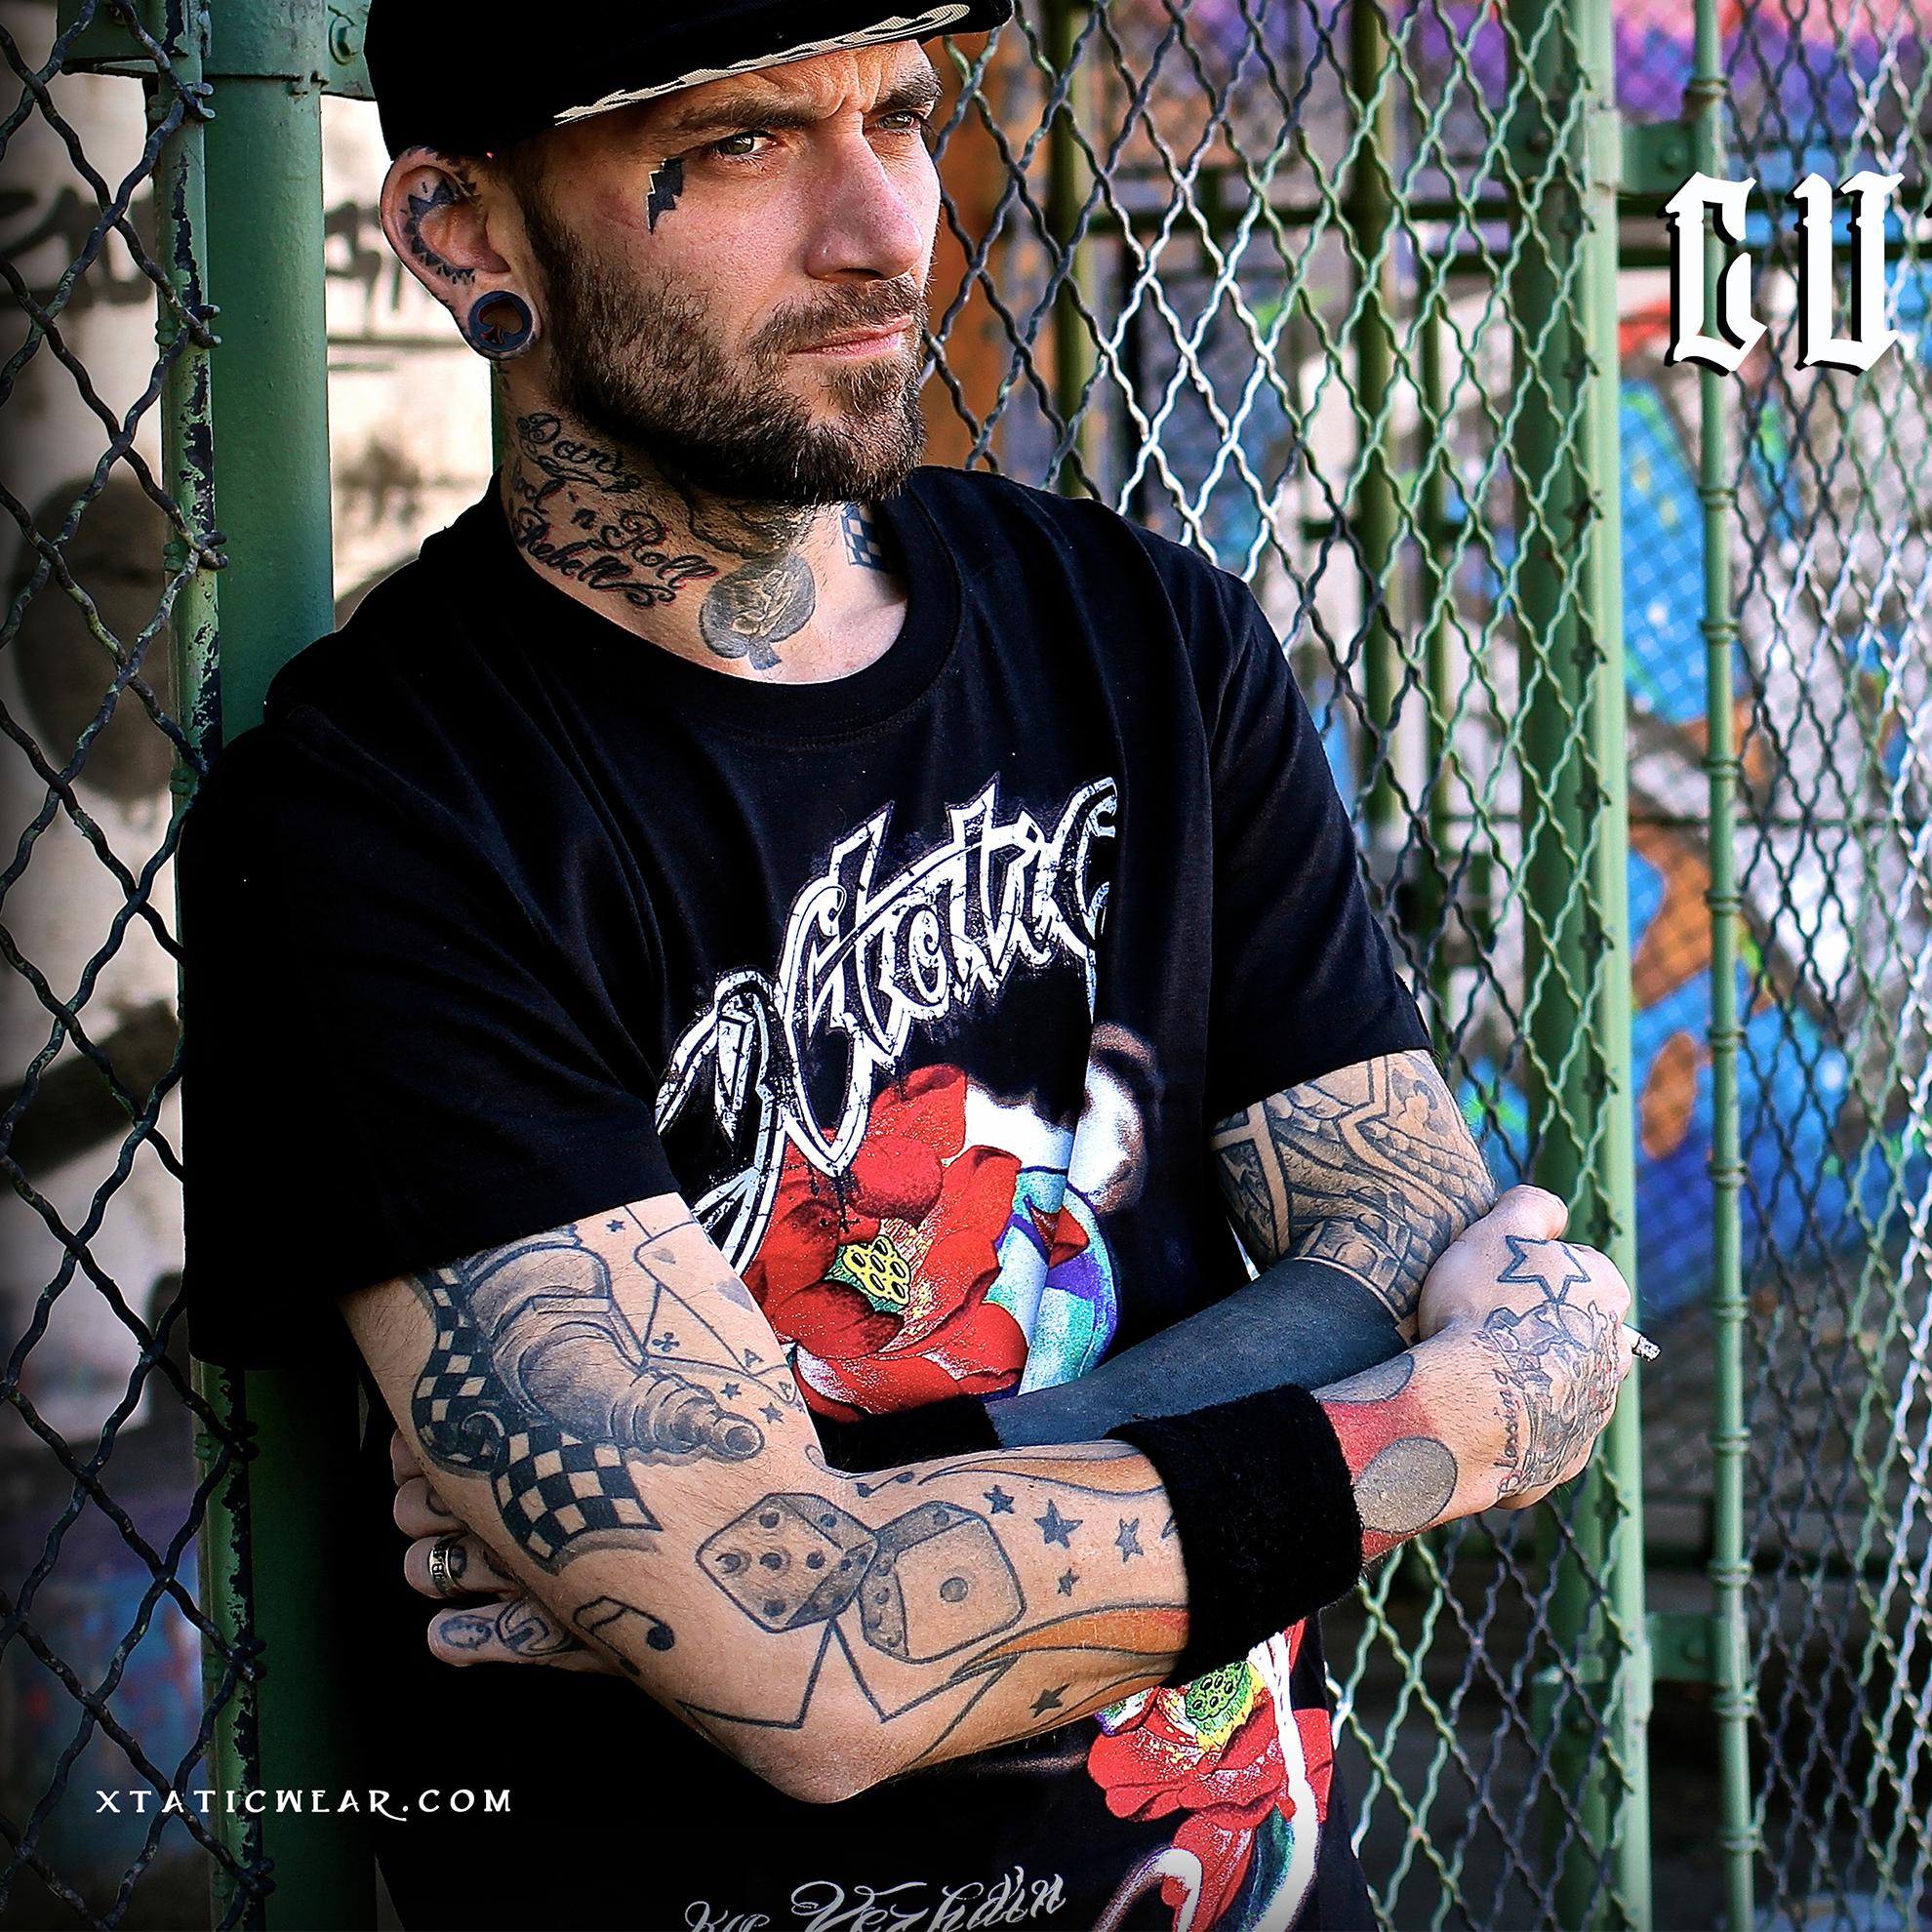 xtatic_wear_vezhdin_bg_art_tee_t_shirts_2.jpg